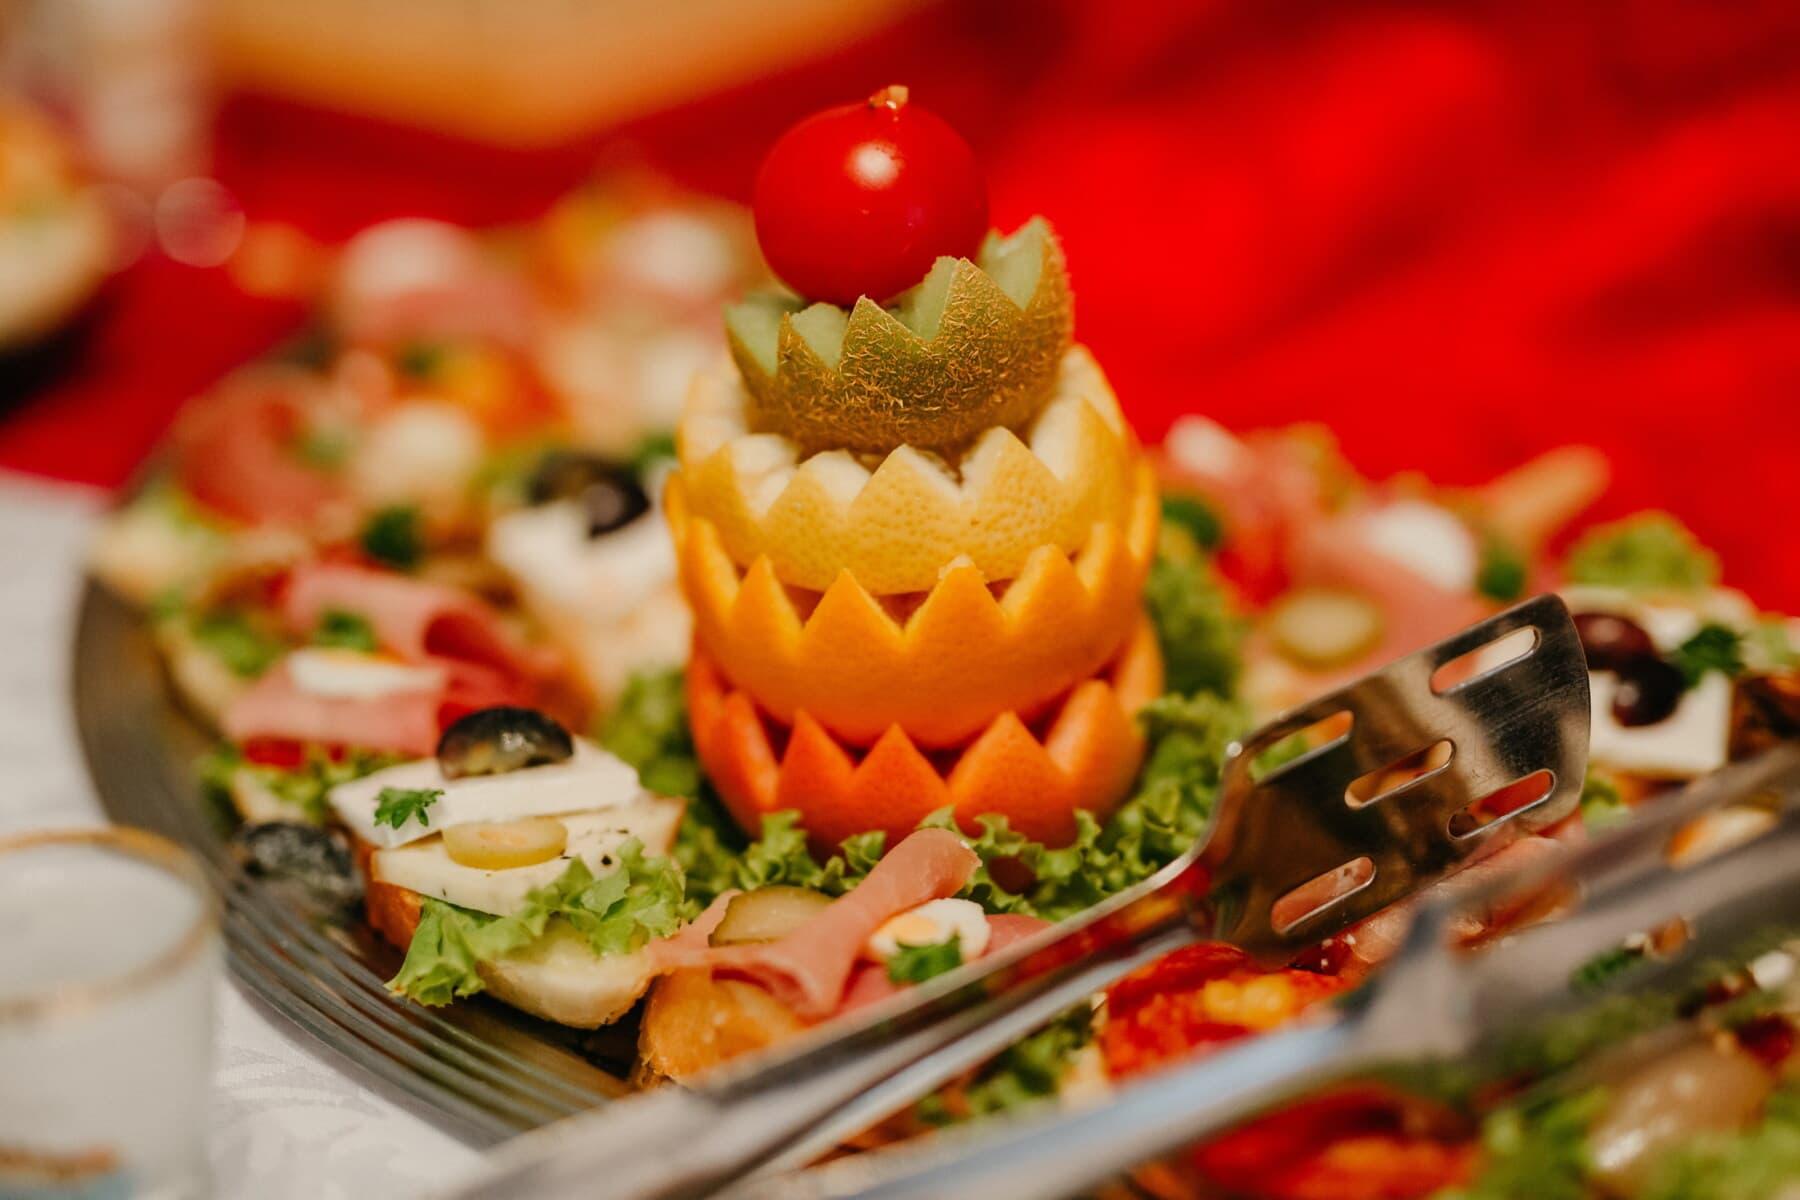 lanche, salada, quivi, buffet de saladas, laranjas, casca de laranja, delicioso, aperitivo, jantar, vegetal